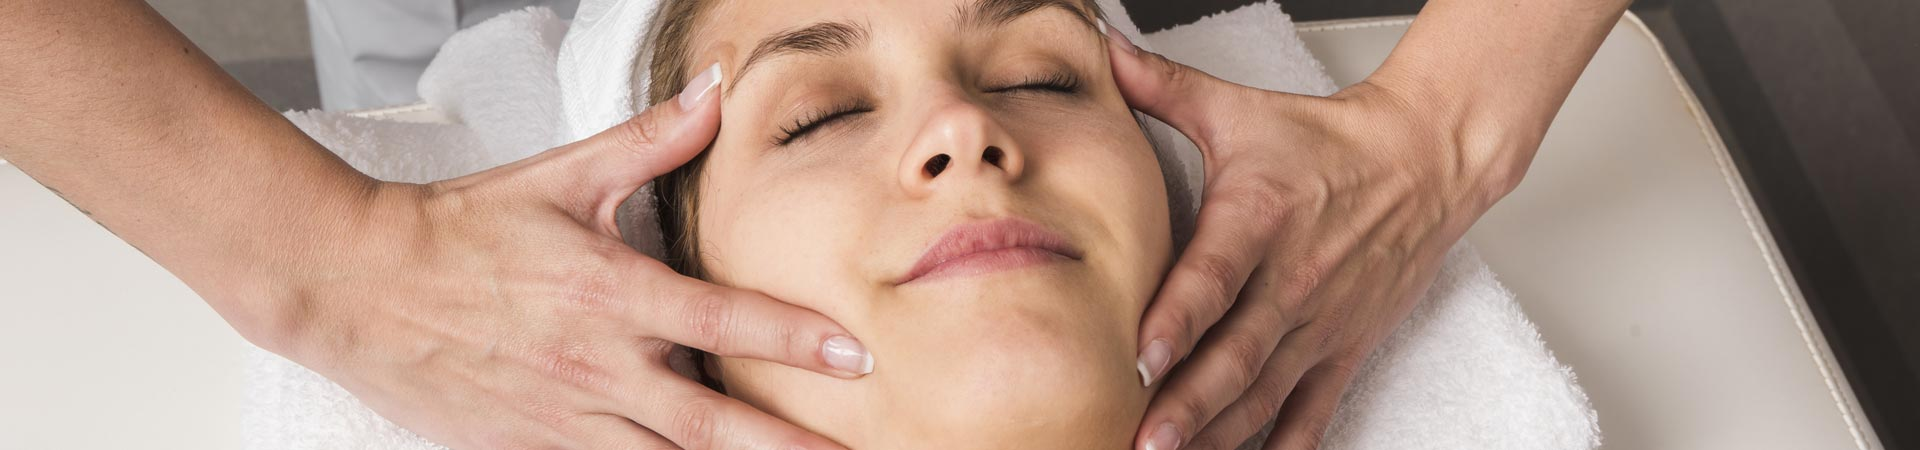 rejuvenation therapy in Kerala